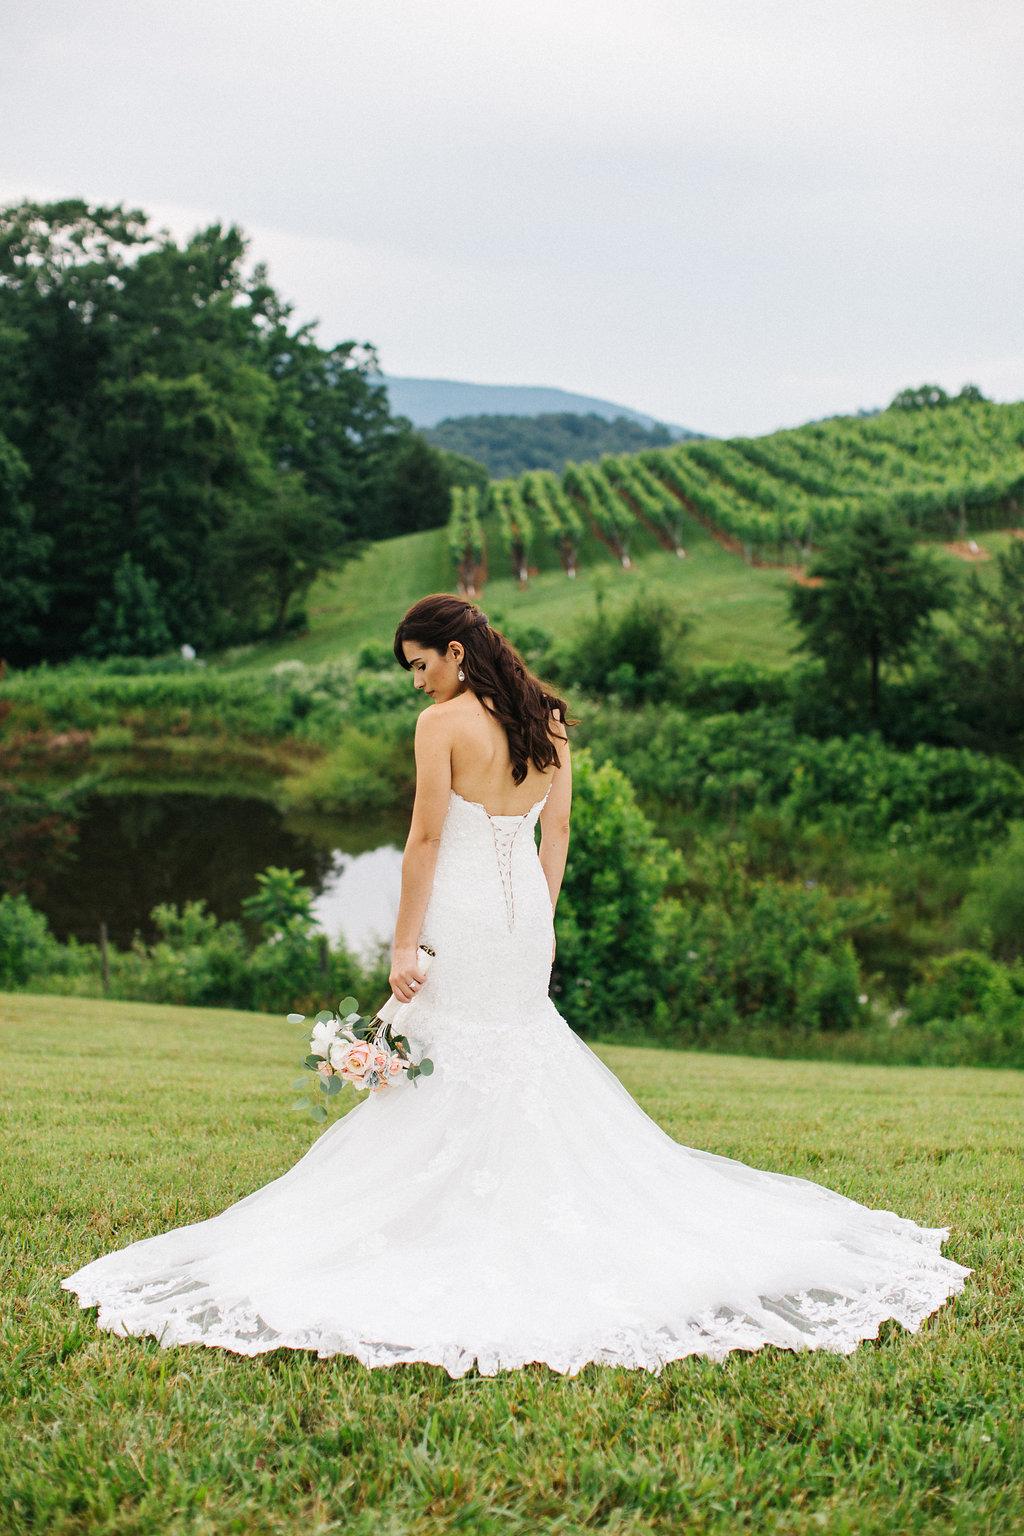 winey-blonde-vineyard-wedding-ideas (1).jpg